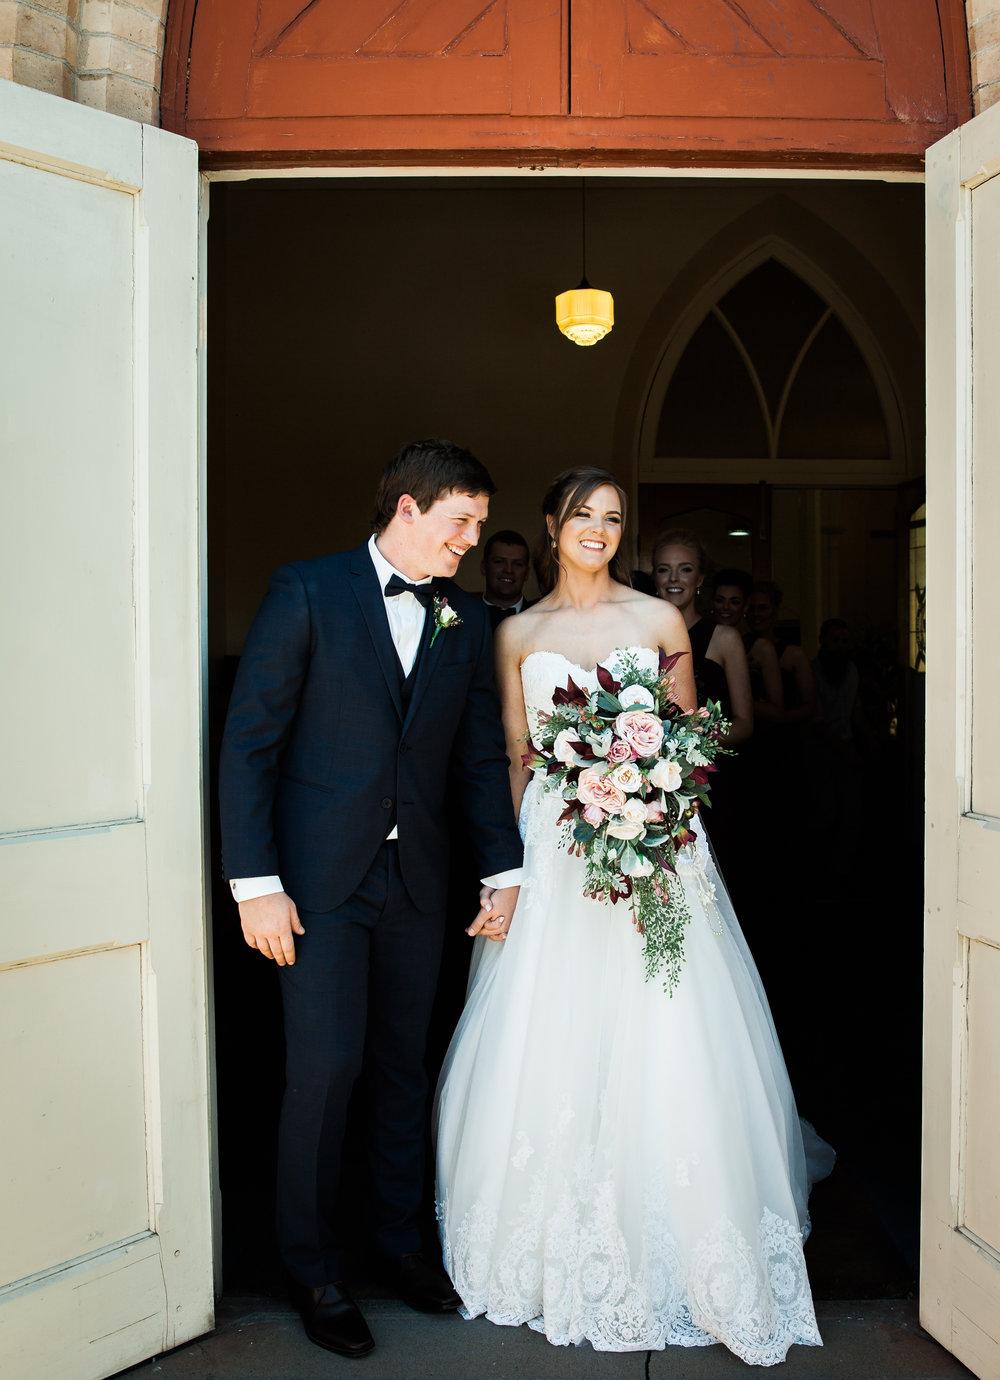 Bendigo Wedding Photography1-2.jpg